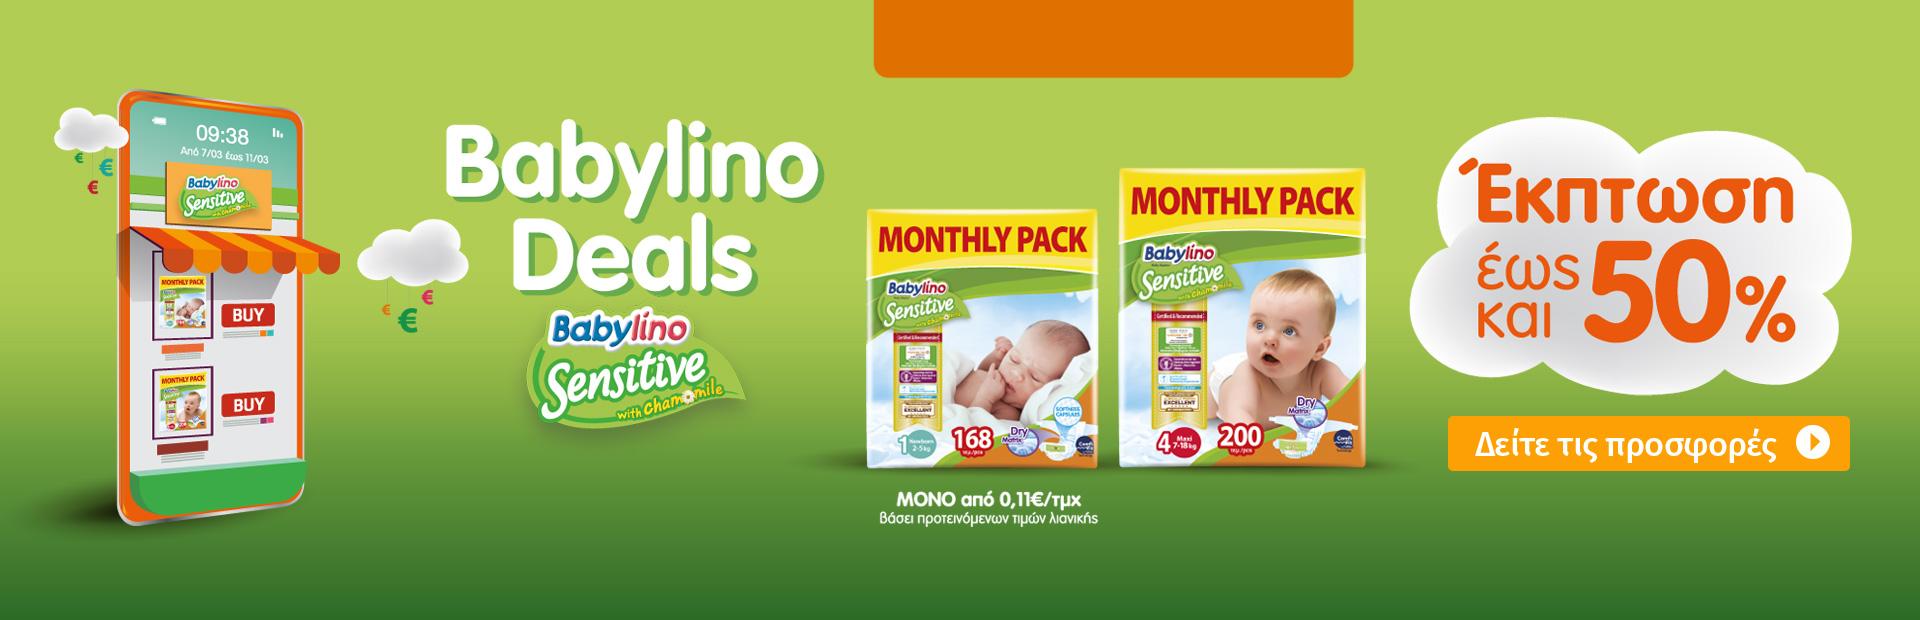 Babylino Pants Value Pack 50%